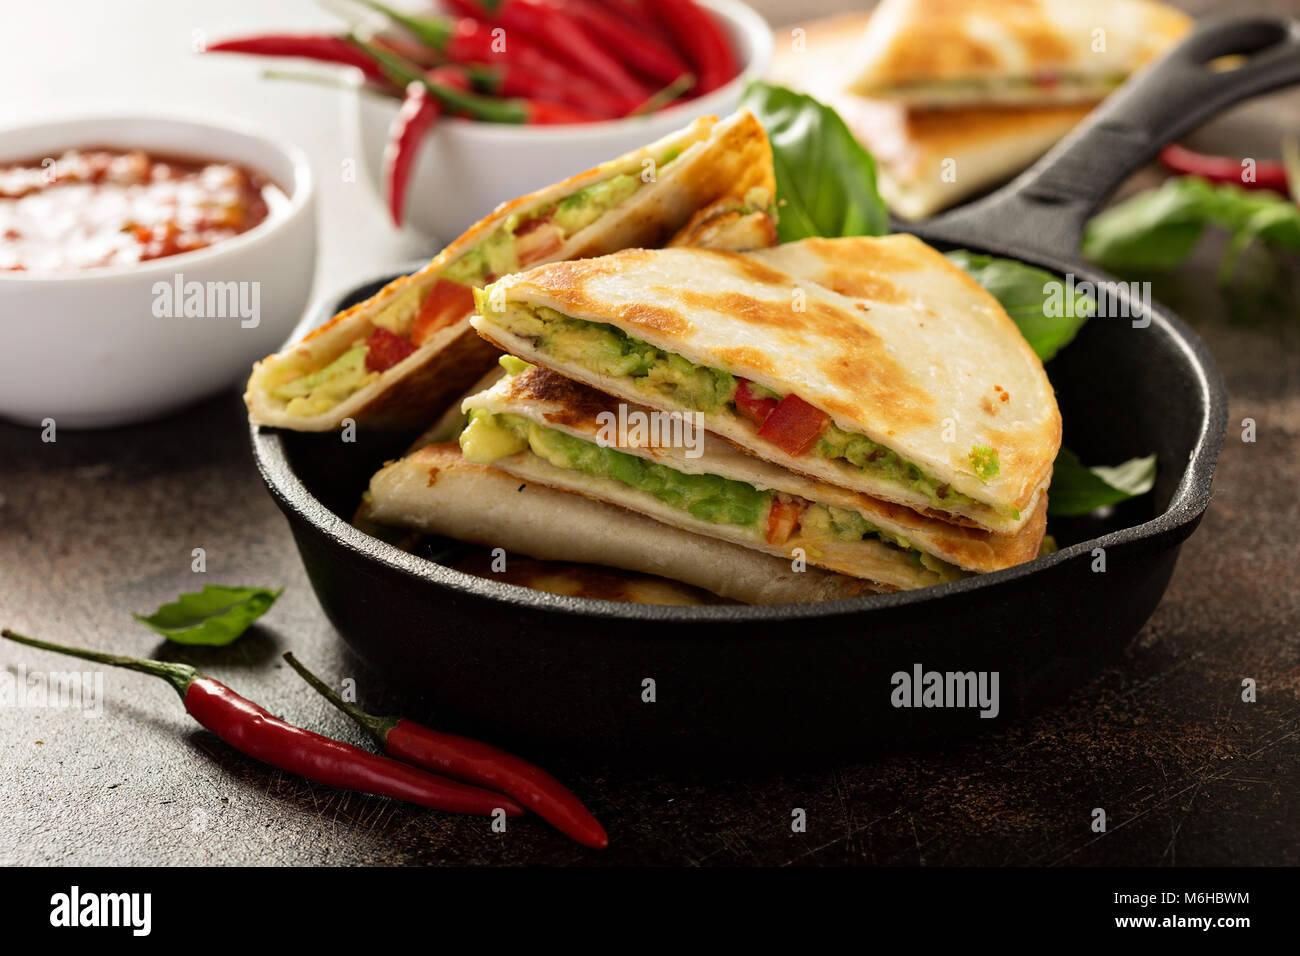 Vegan Quesadillas mit Avocado und rote Paprika Stockbild